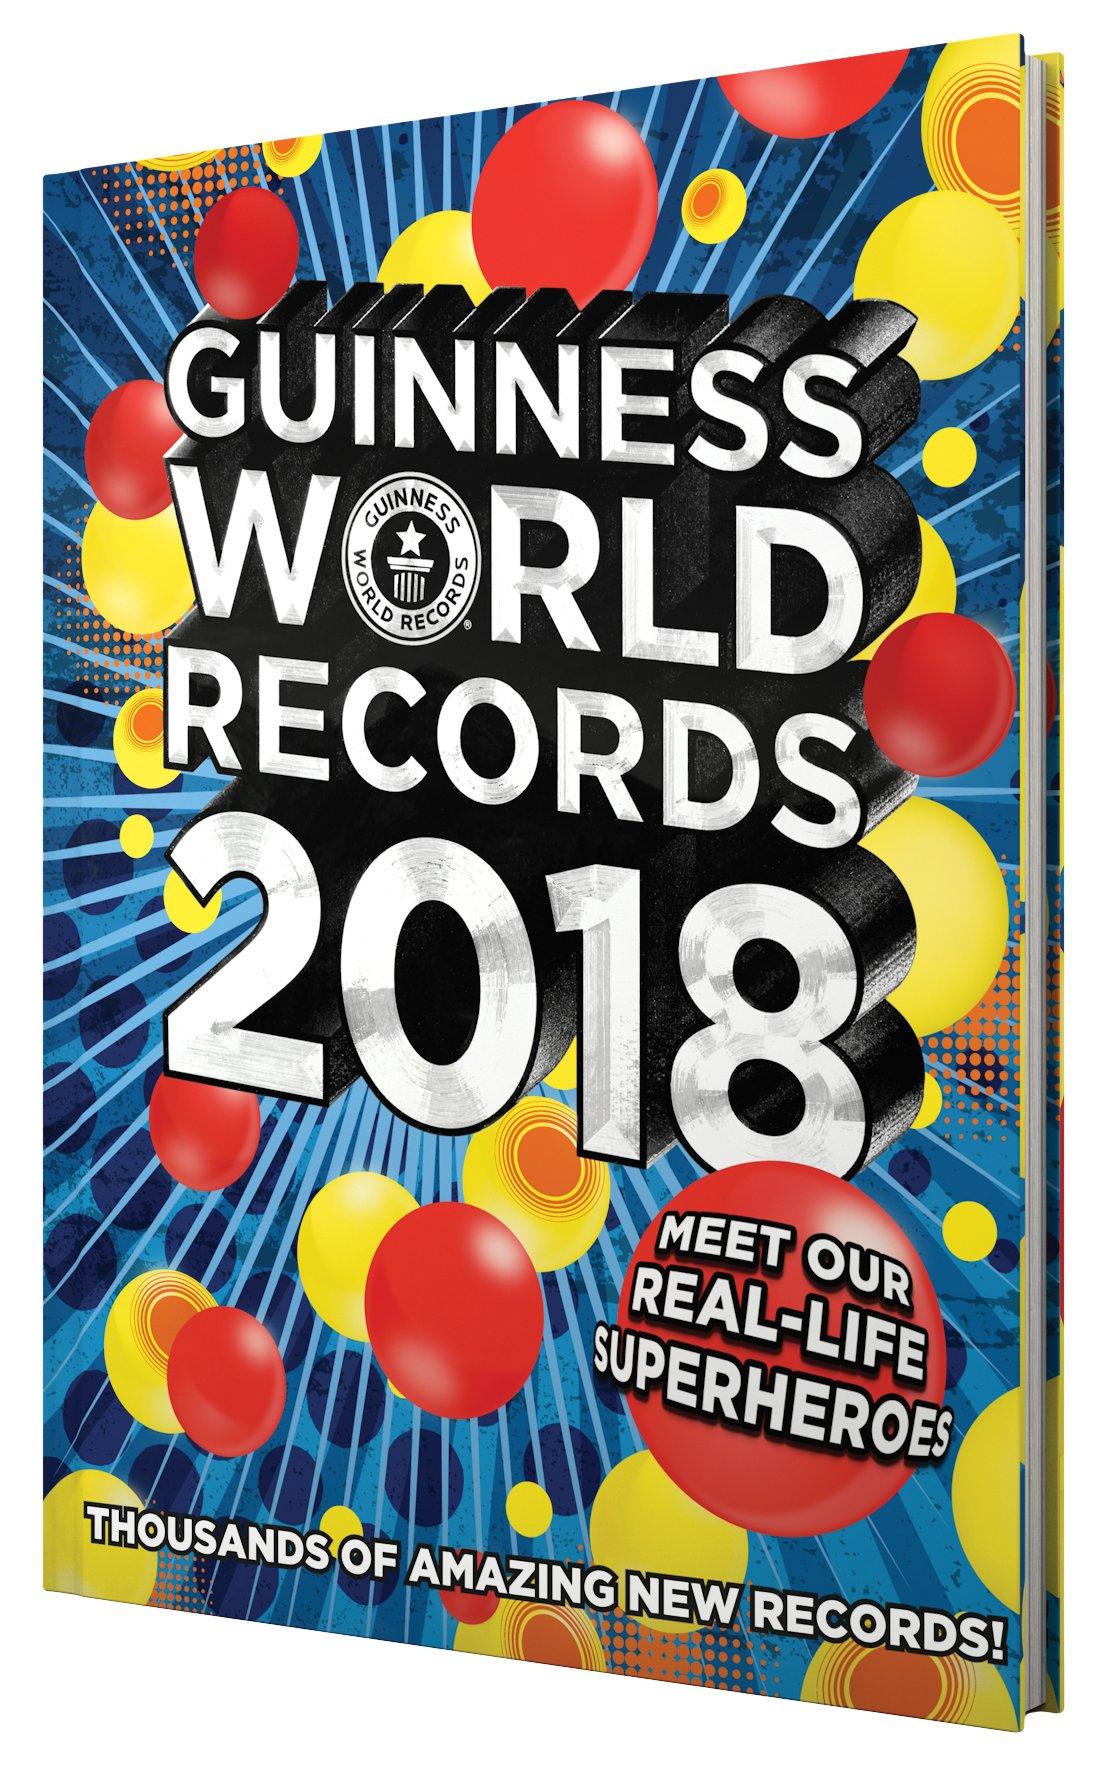 Guinness world records 2018 guinness world records 9781910561713 guinness world records 2018 guinness world records 9781910561713 amazon books ccuart Gallery